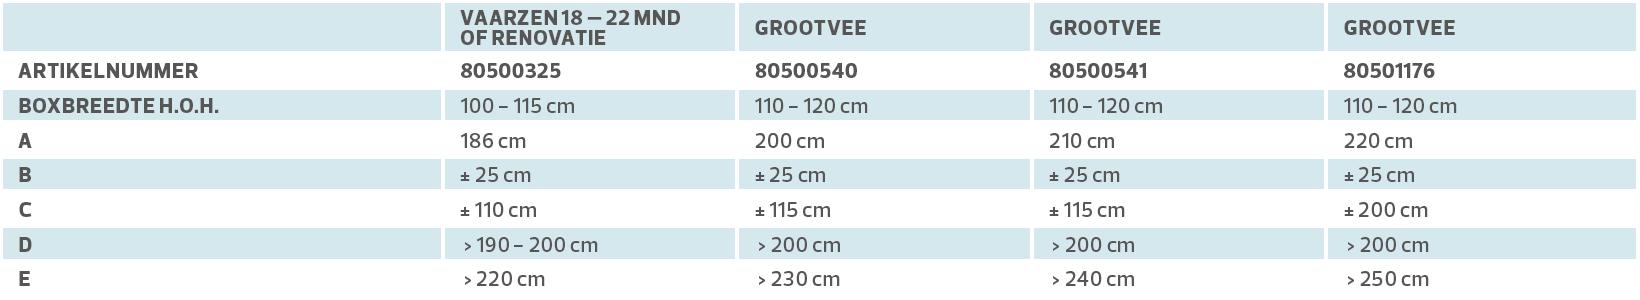 HR600 zwevende box grootvee maten